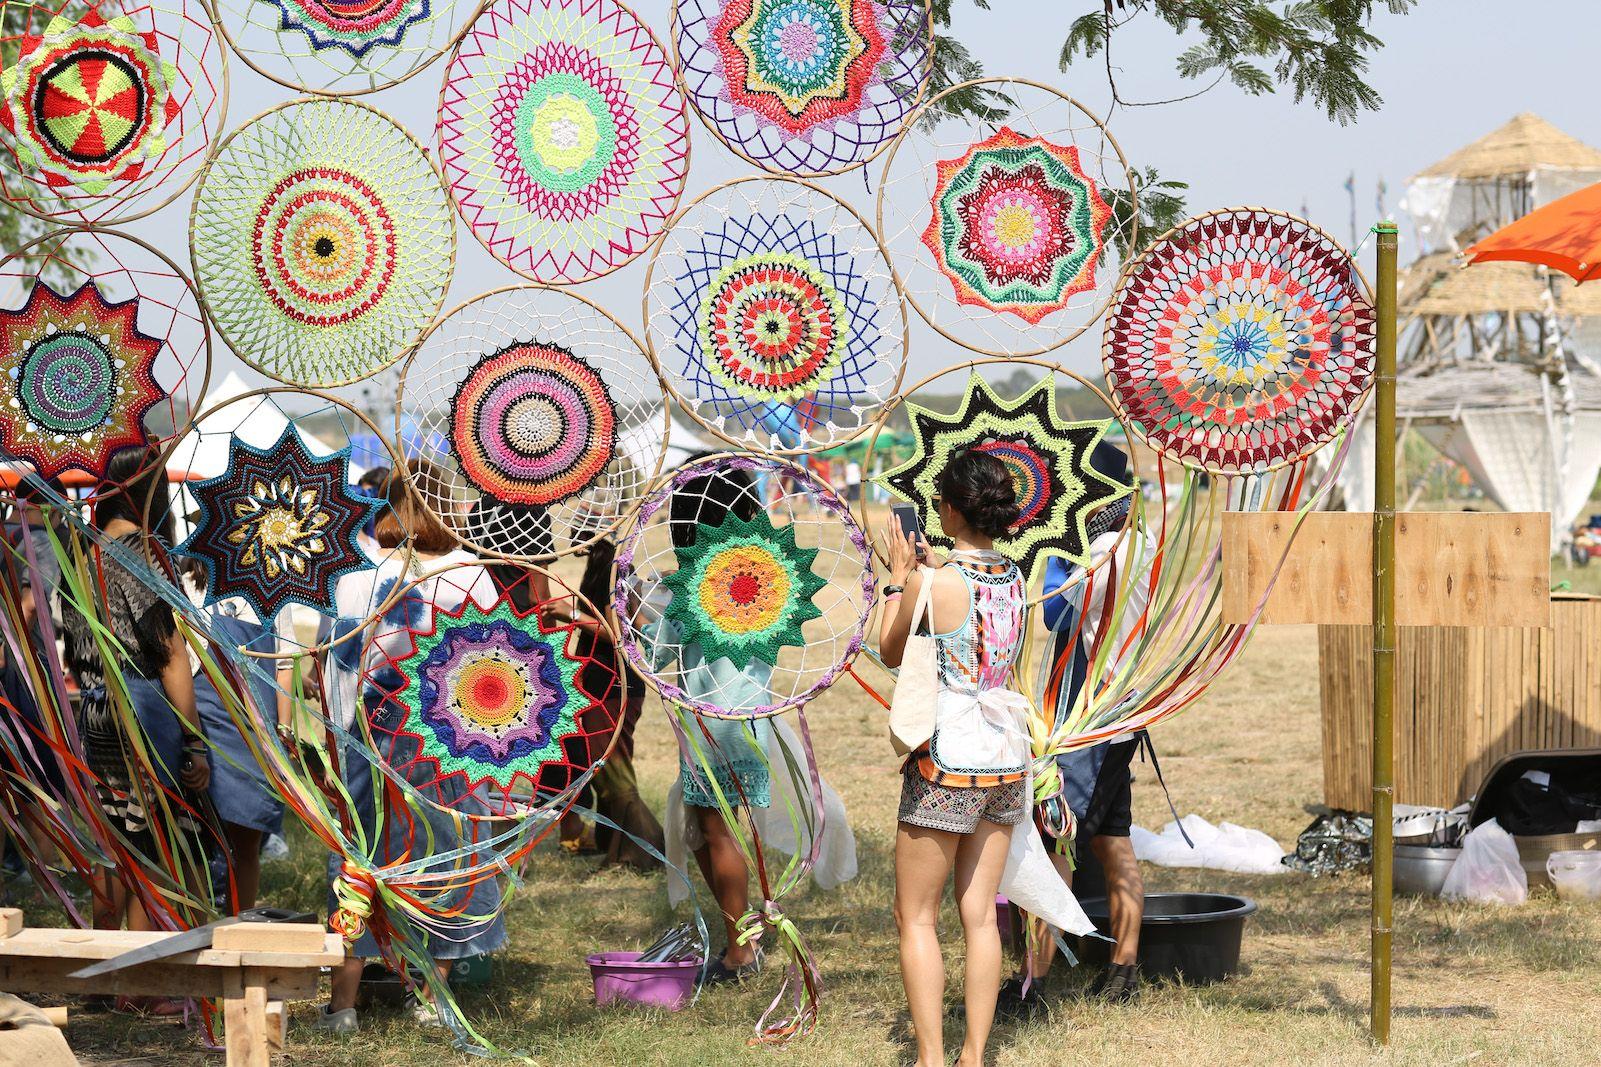 The Founder Of Wonderfruit Festival Talks Sustainability & Spreading Good Vibes